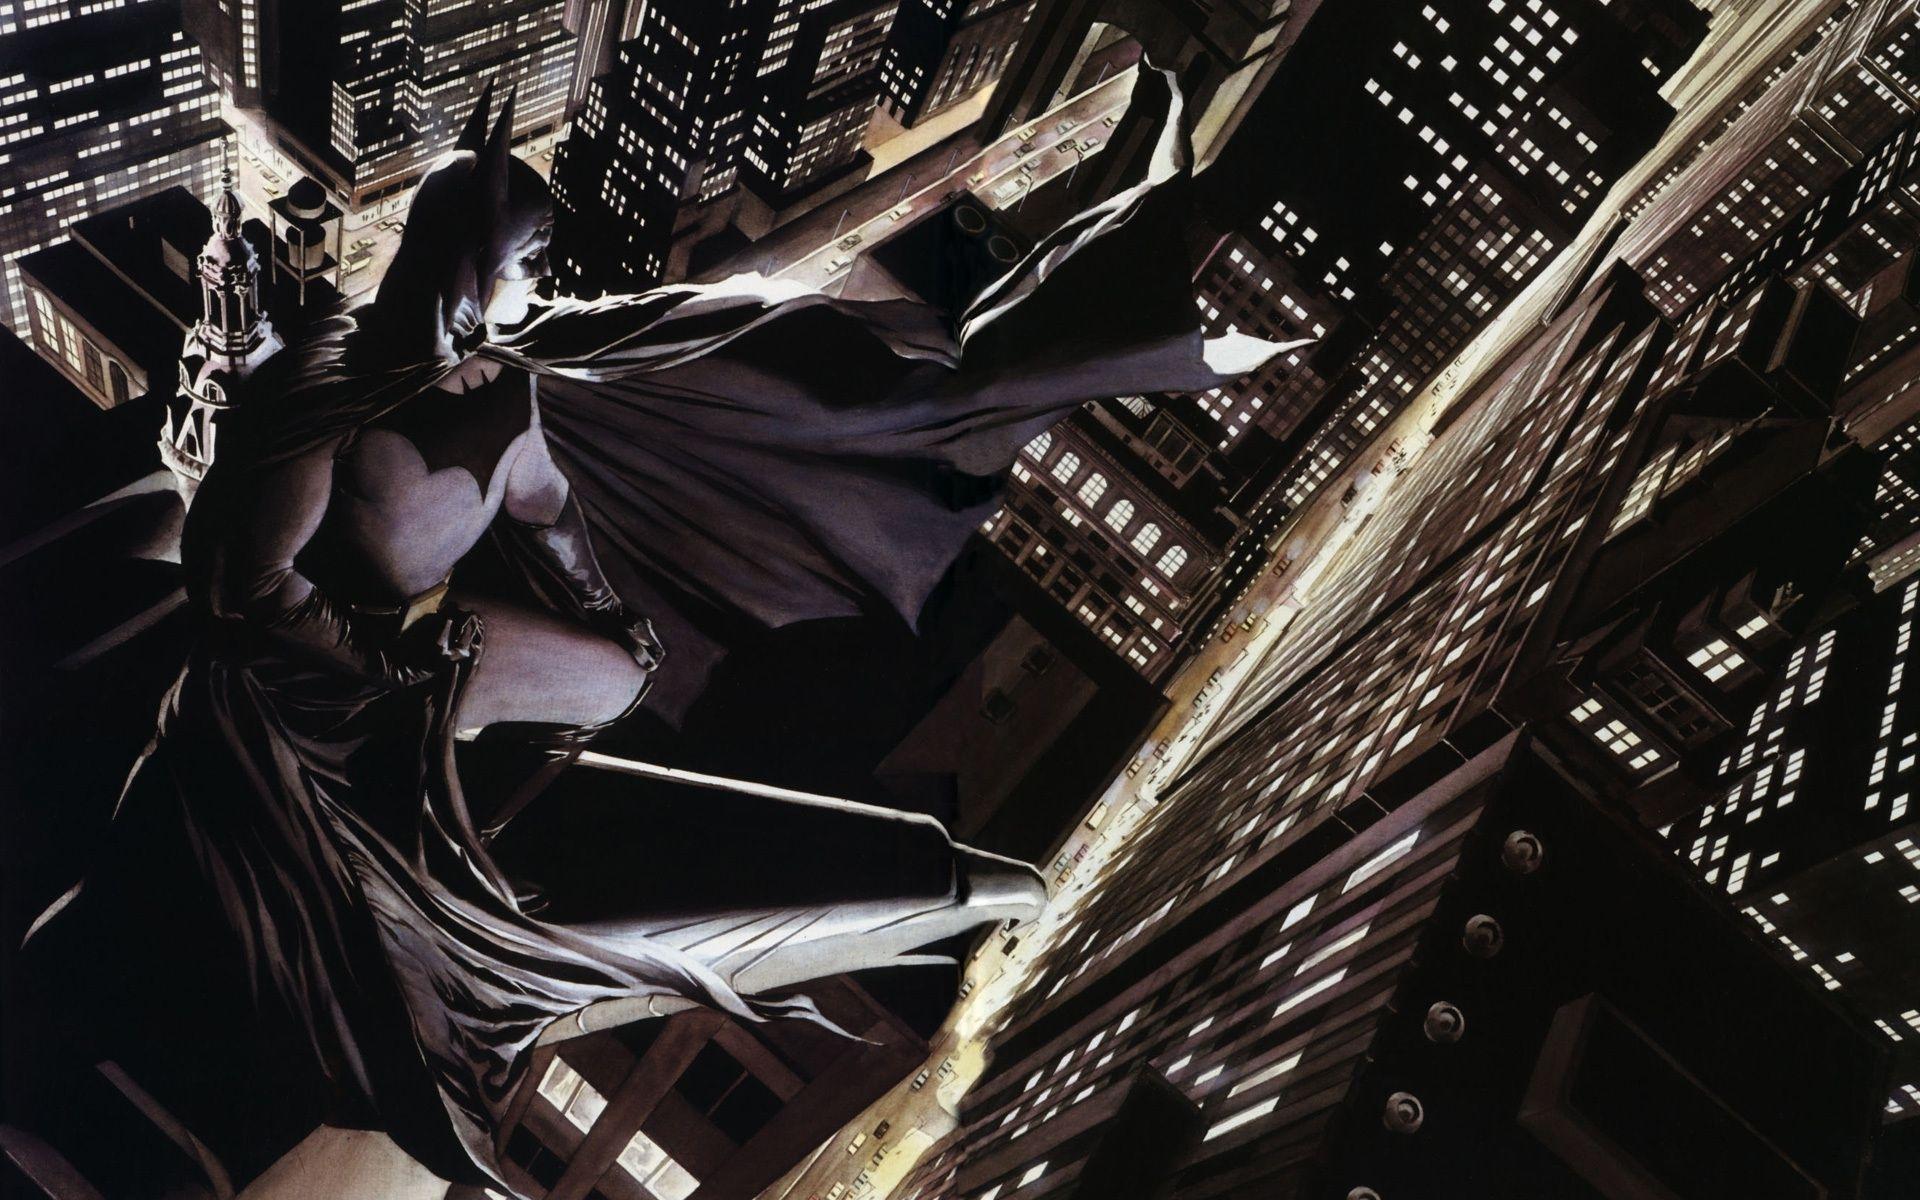 batman | description: free batman wallpaper is wallapers for pc